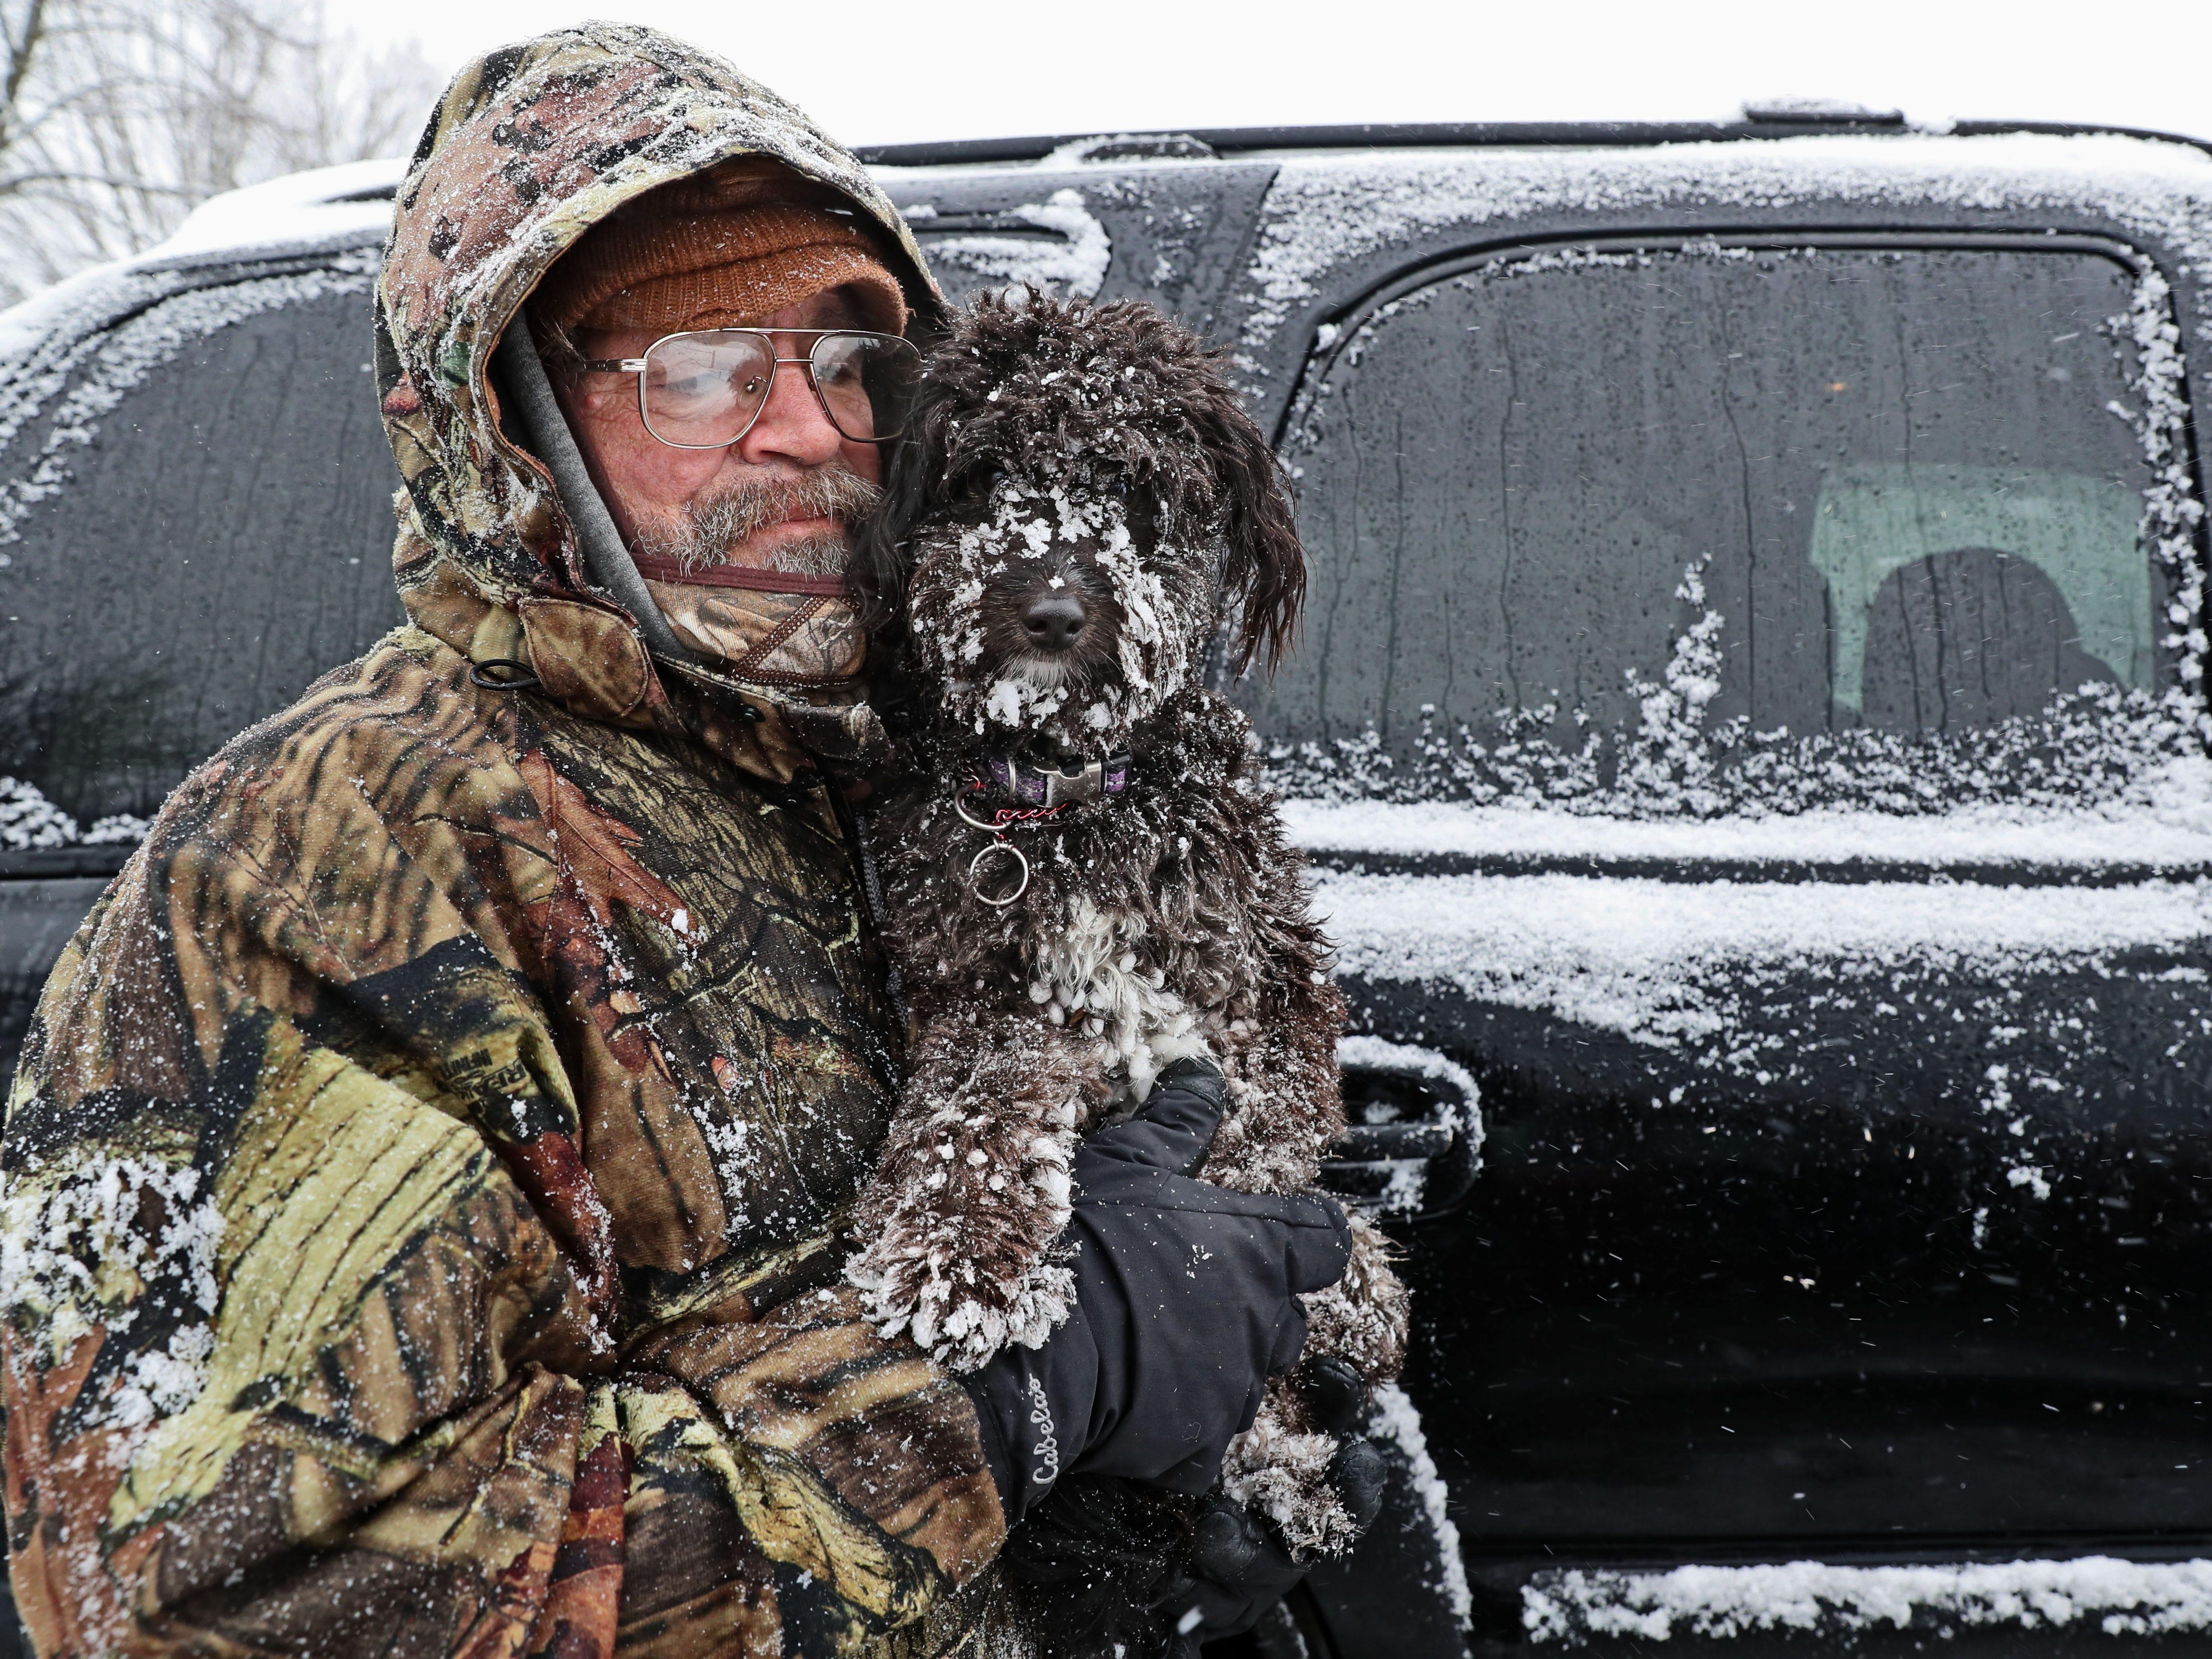 Steve Payne of Stone Bank and his dog Geordi finished up their morning walk at the dog run in Nashotah Park near Nashotah in Waukesha County.